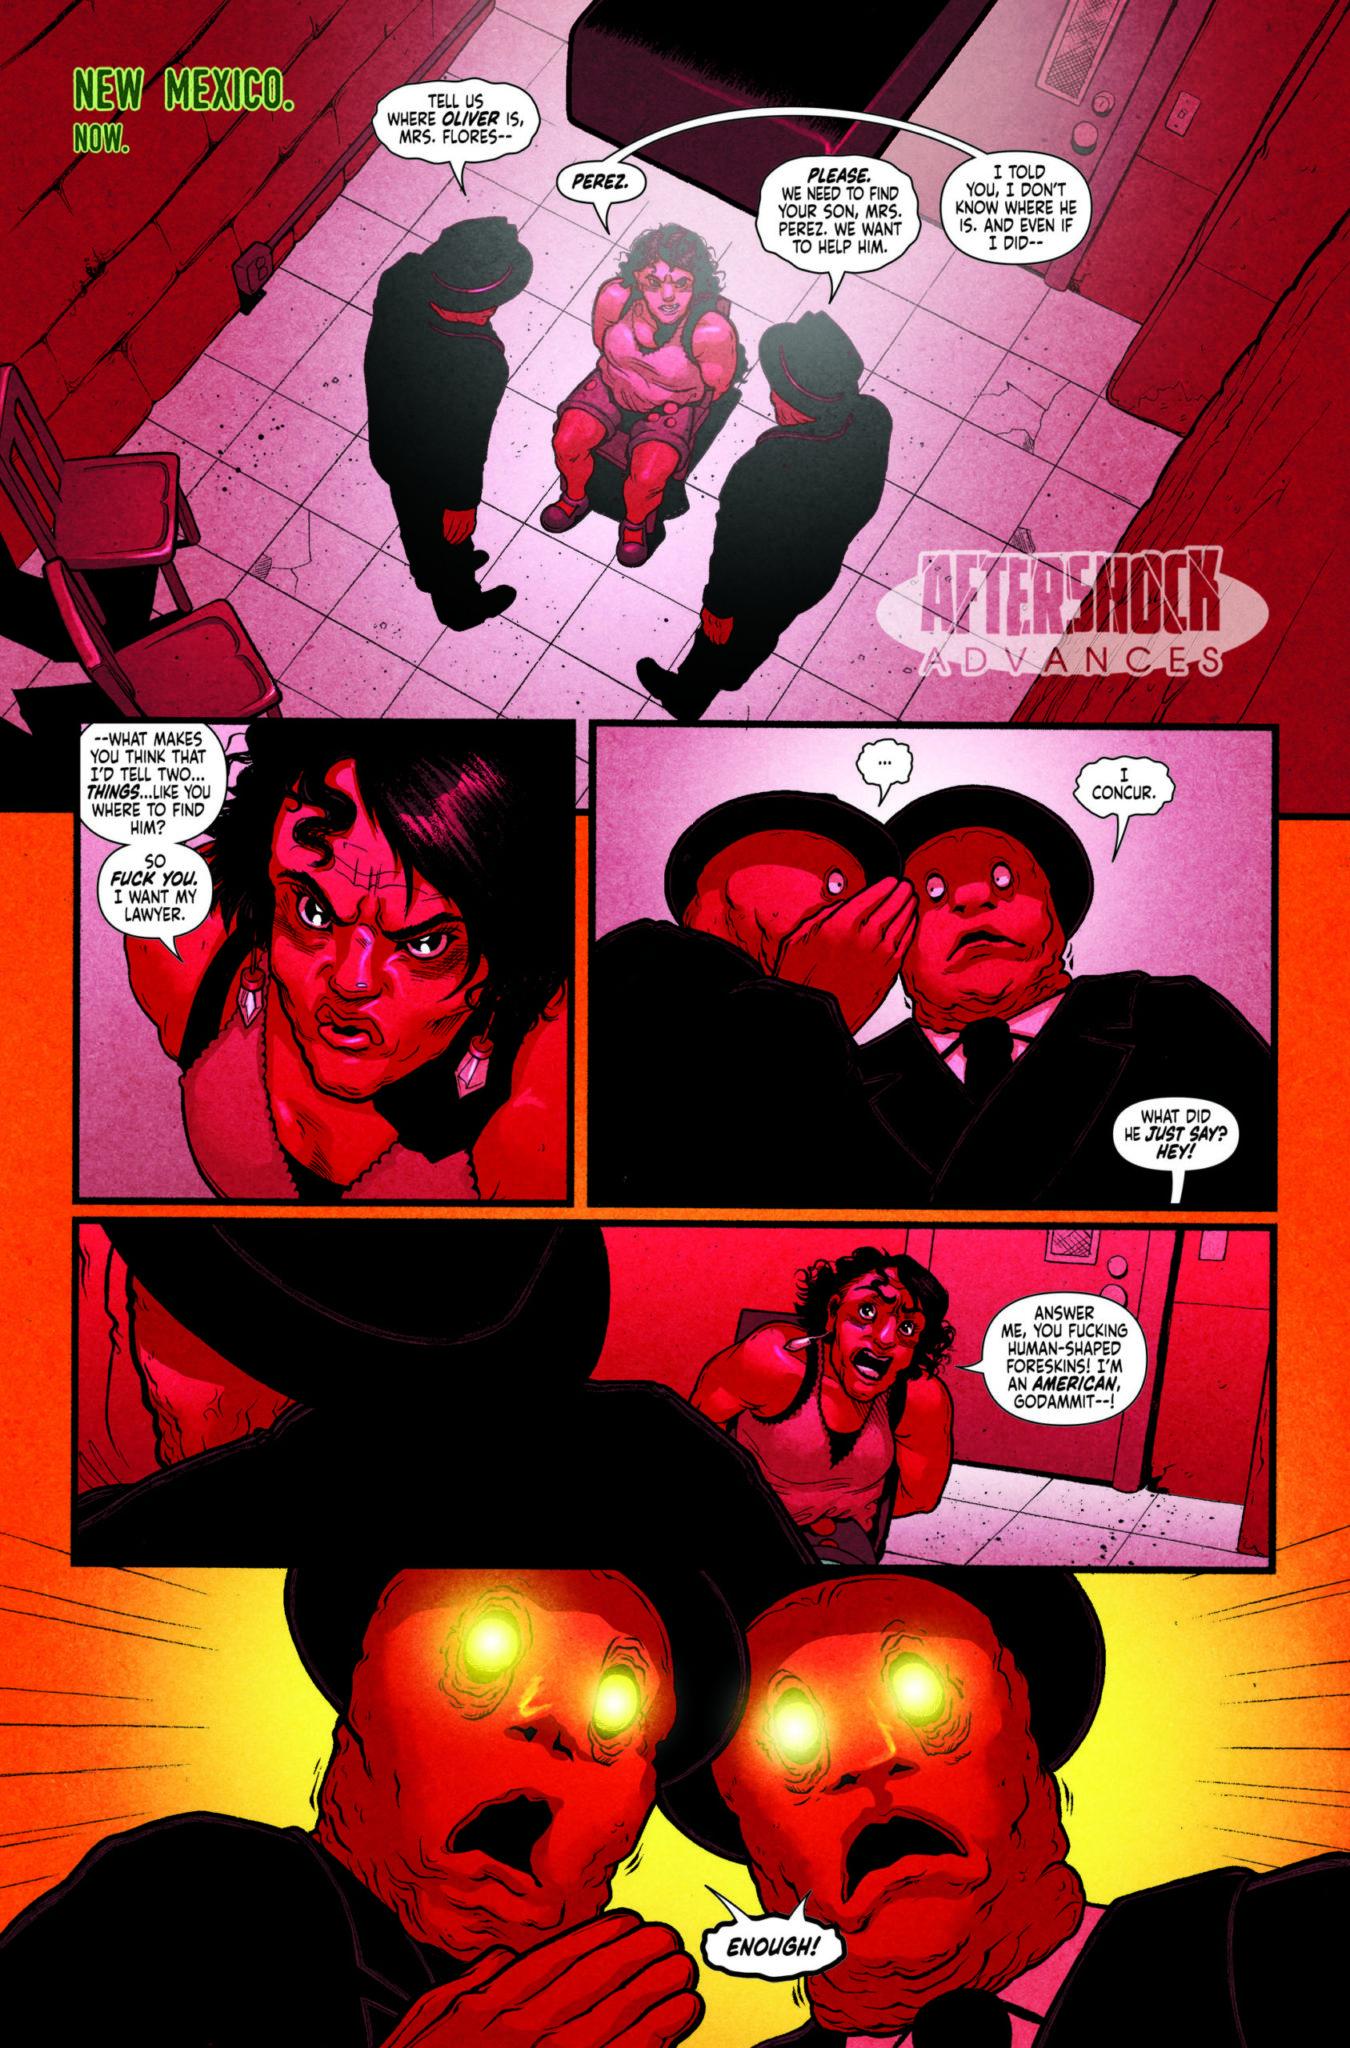 MIDNIGHT VISTA #4 - AfterShock Comics Exclusive Preview